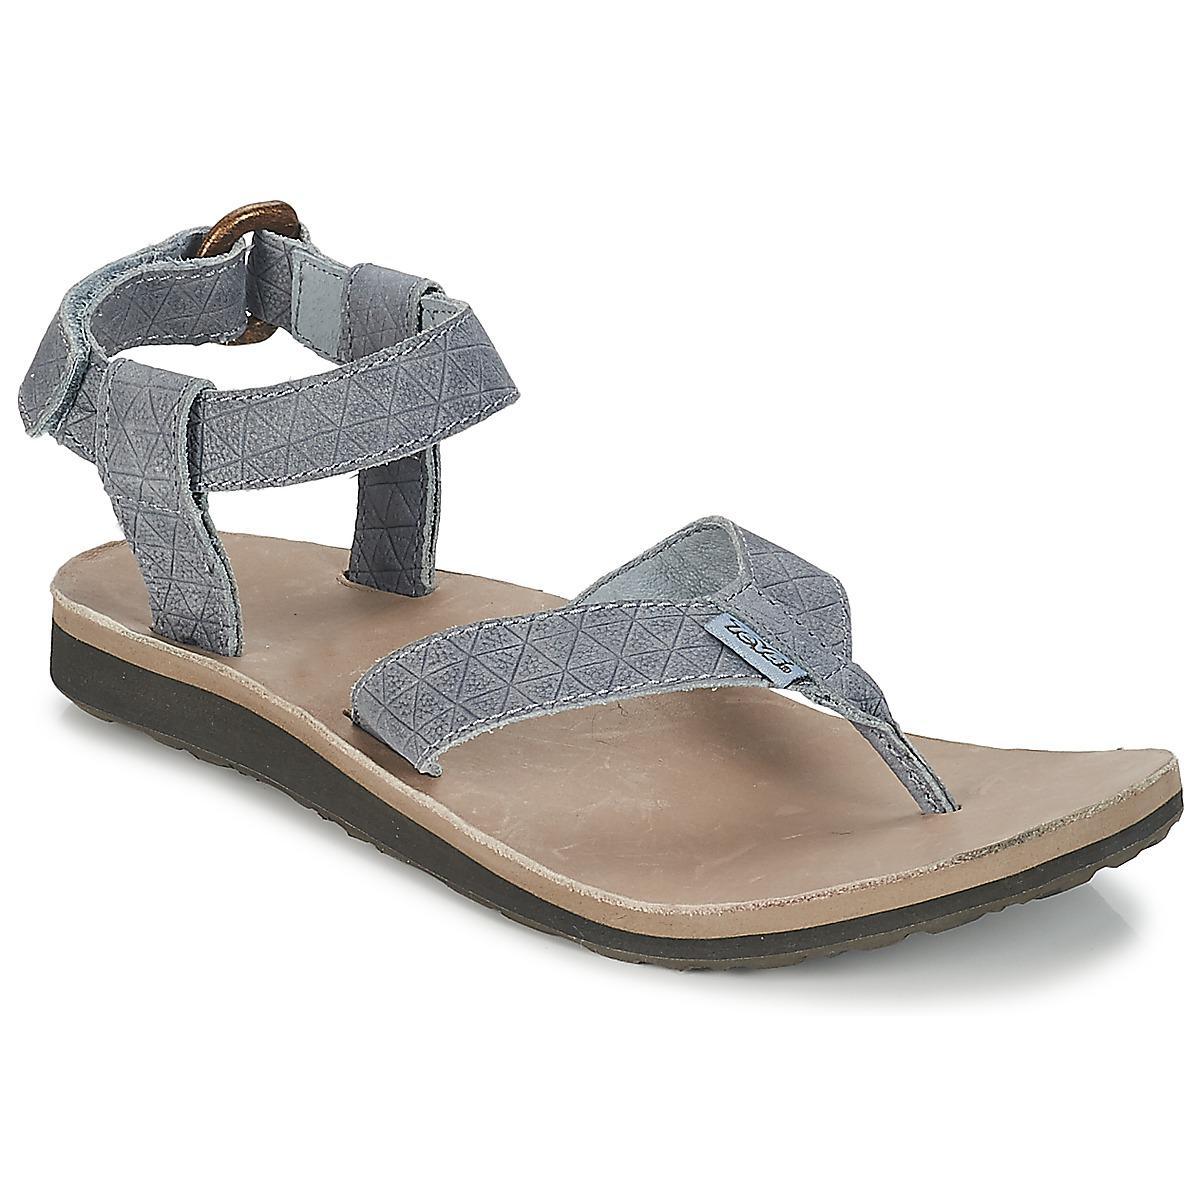 Leather Grey Teva Original Sandal Diamond Gray In Sandals Women's lK3FcJuT1